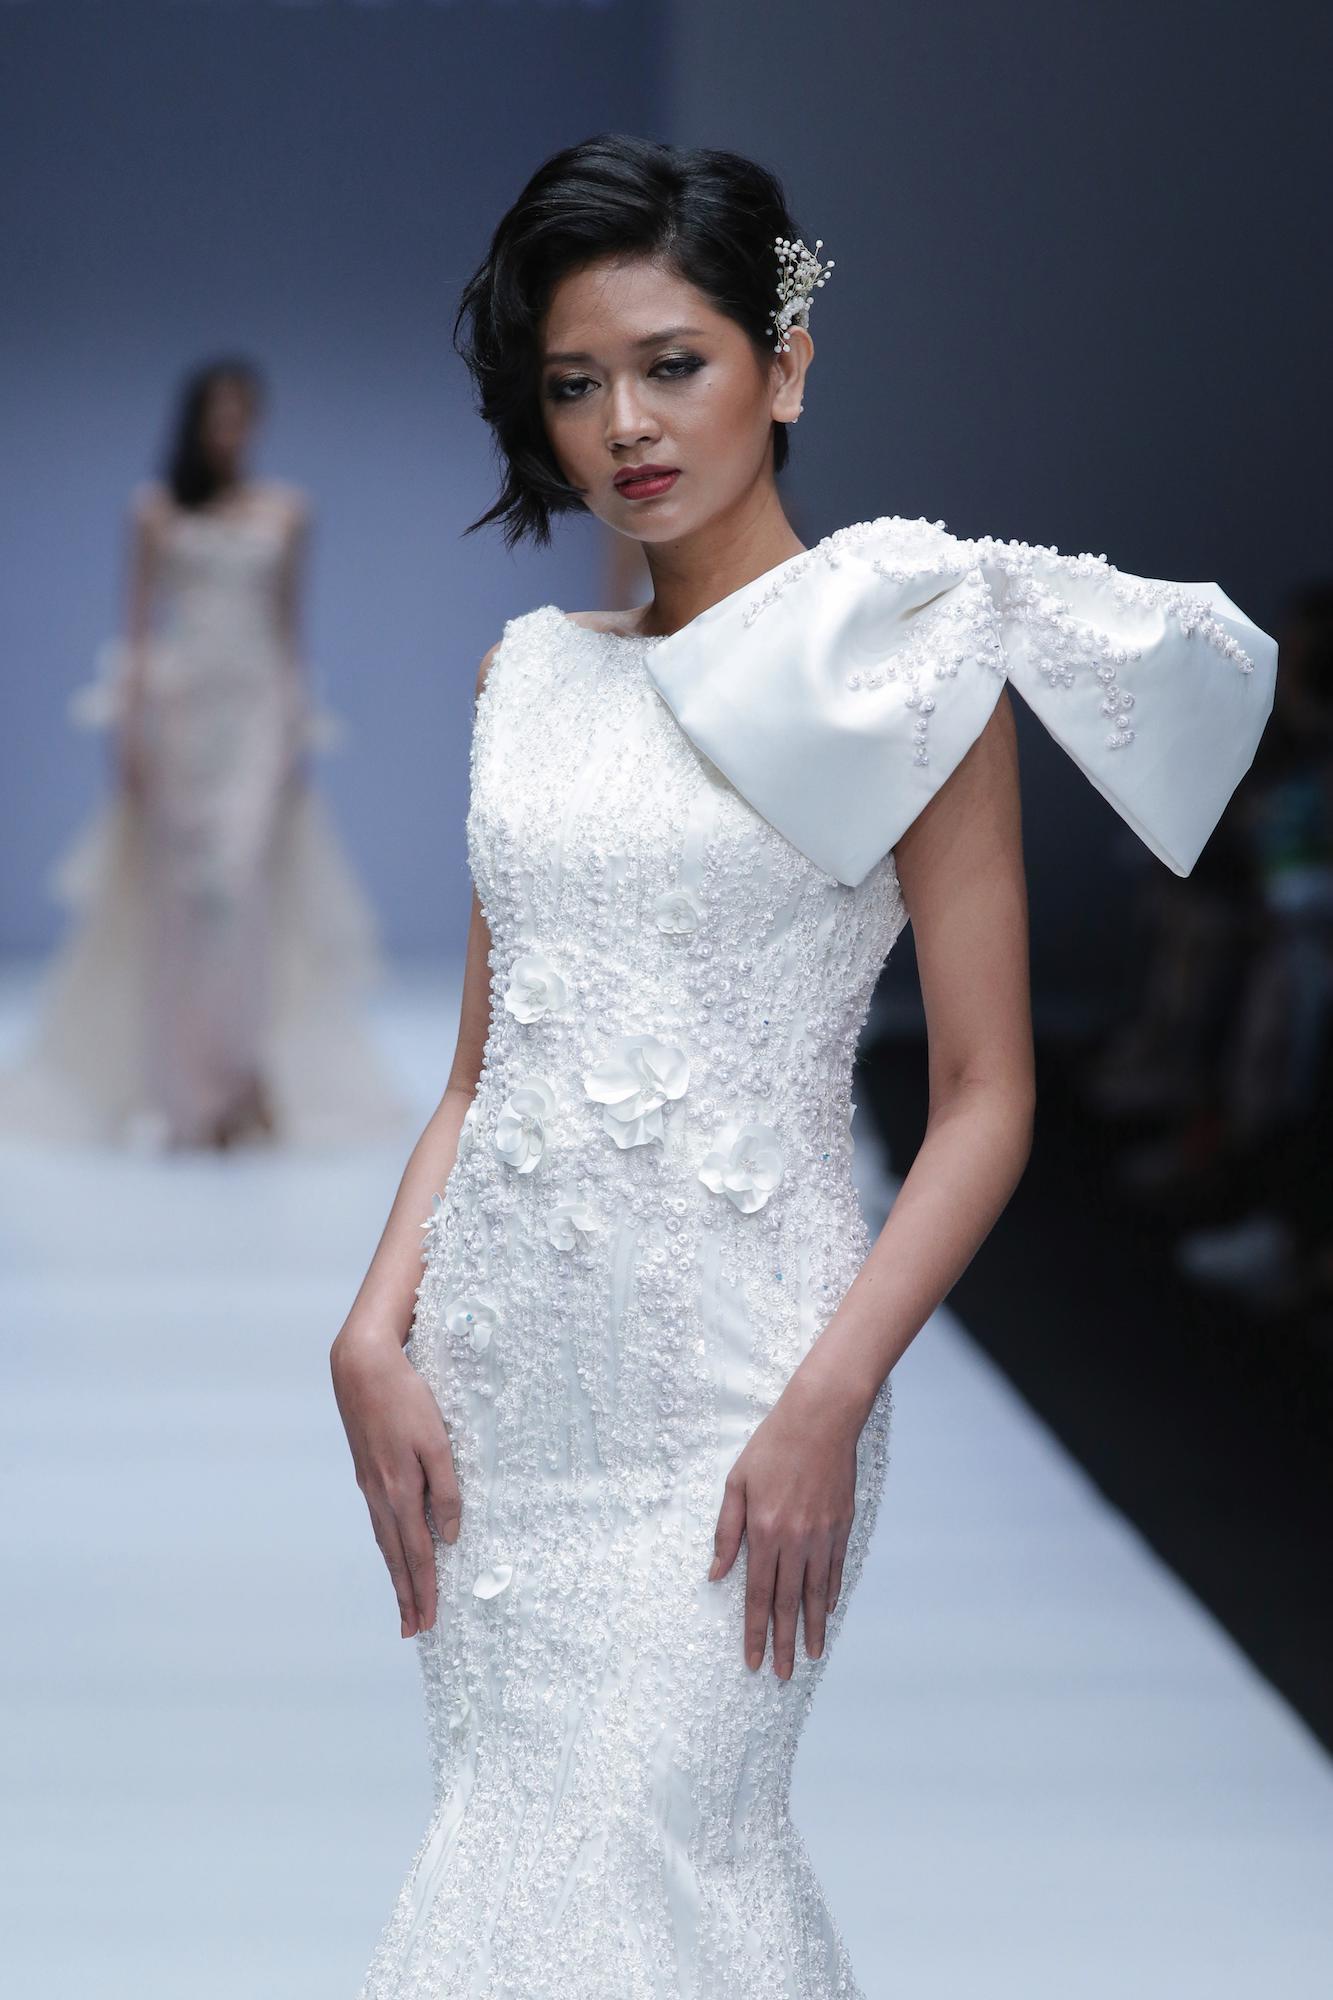 Wanita asia dengan rambut hitam model rambut pixie dengan tekstur menggunakan baju pengantin – Jakarta Fashion Week 2019